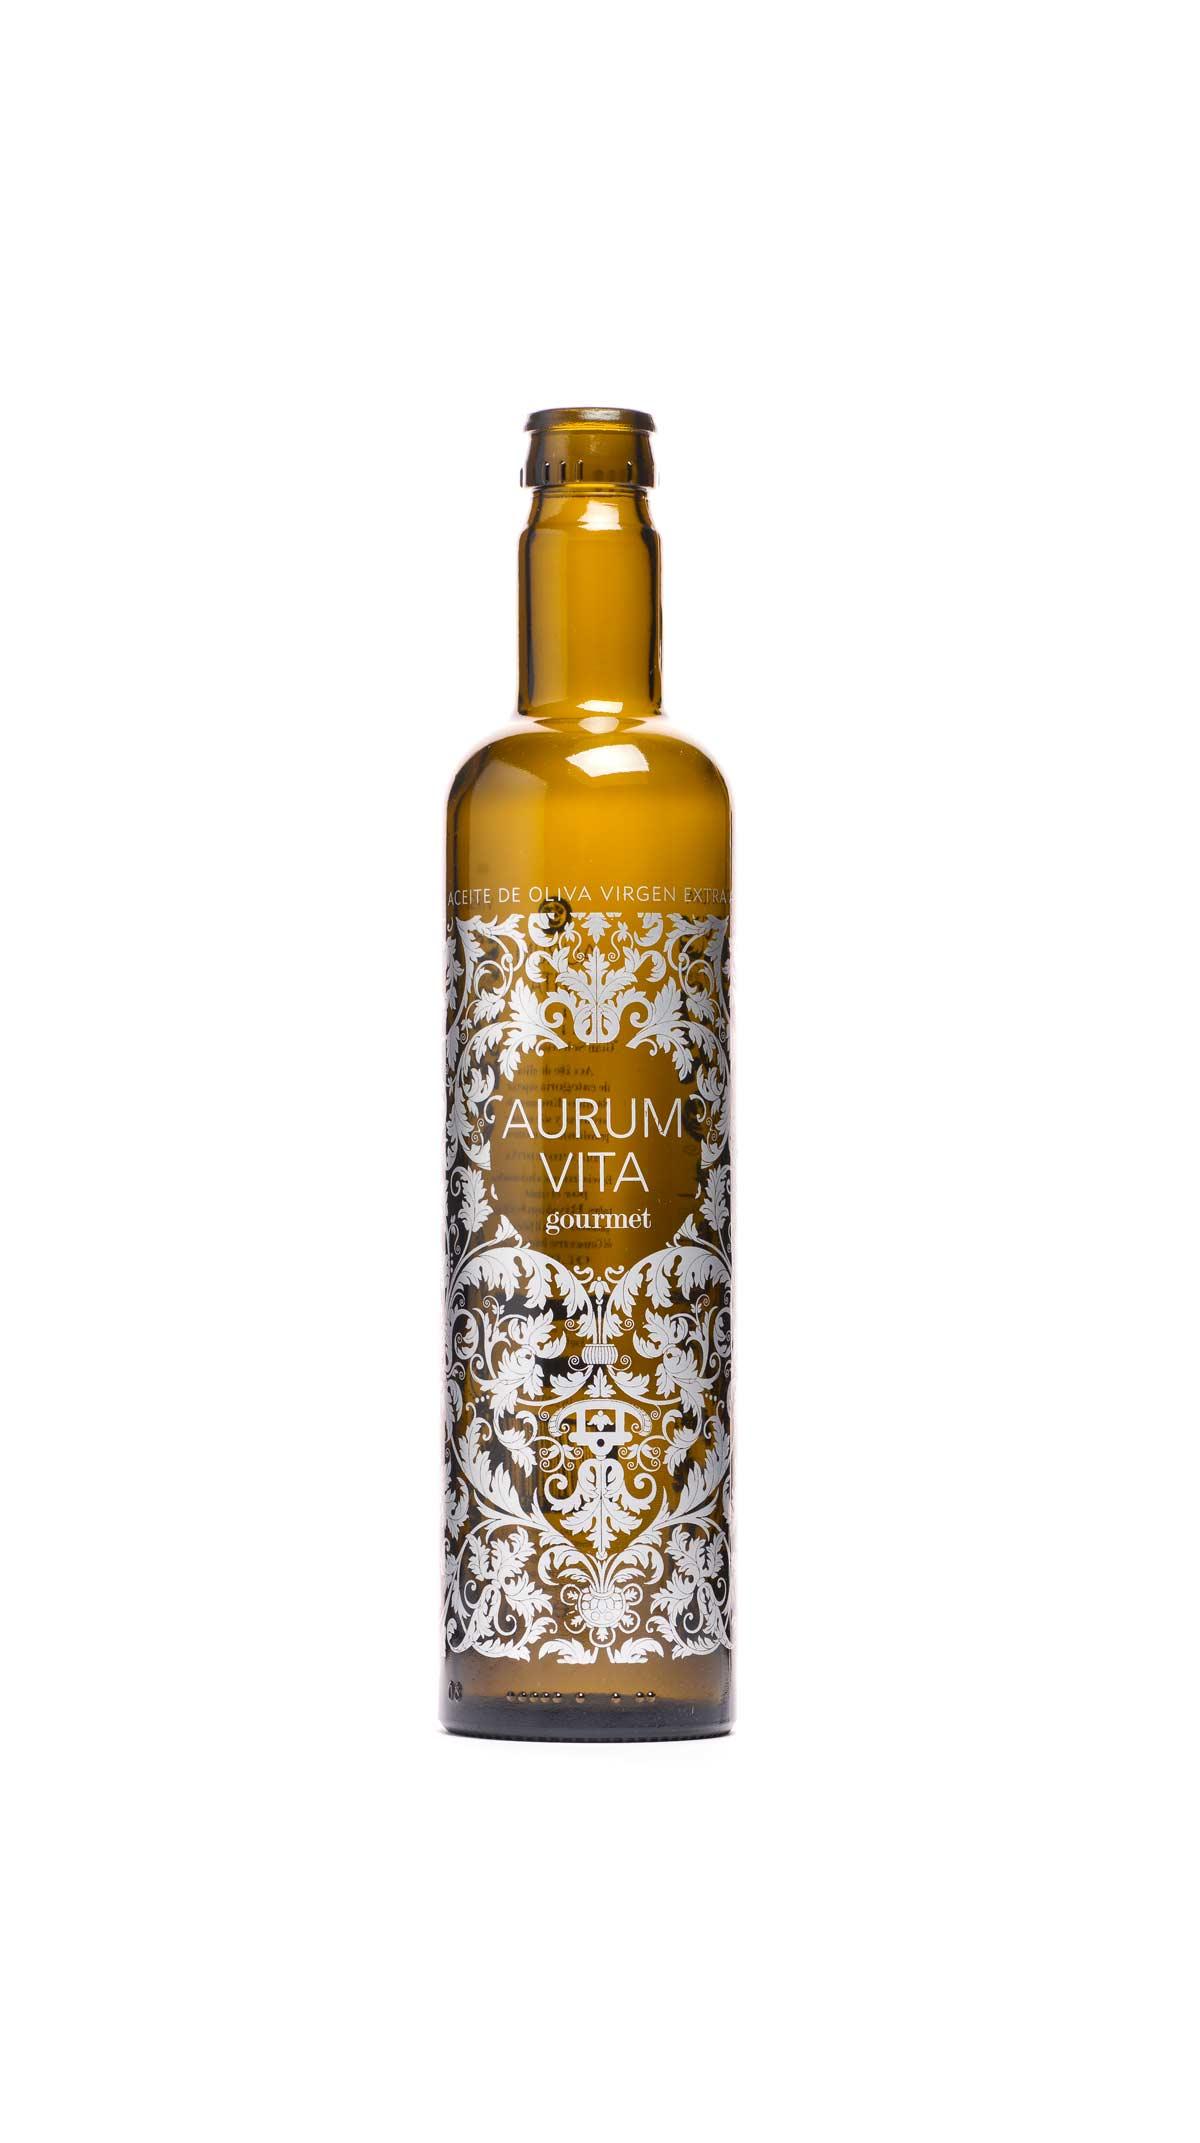 Aurum Vita Gourmet - Serigrafía Casbe